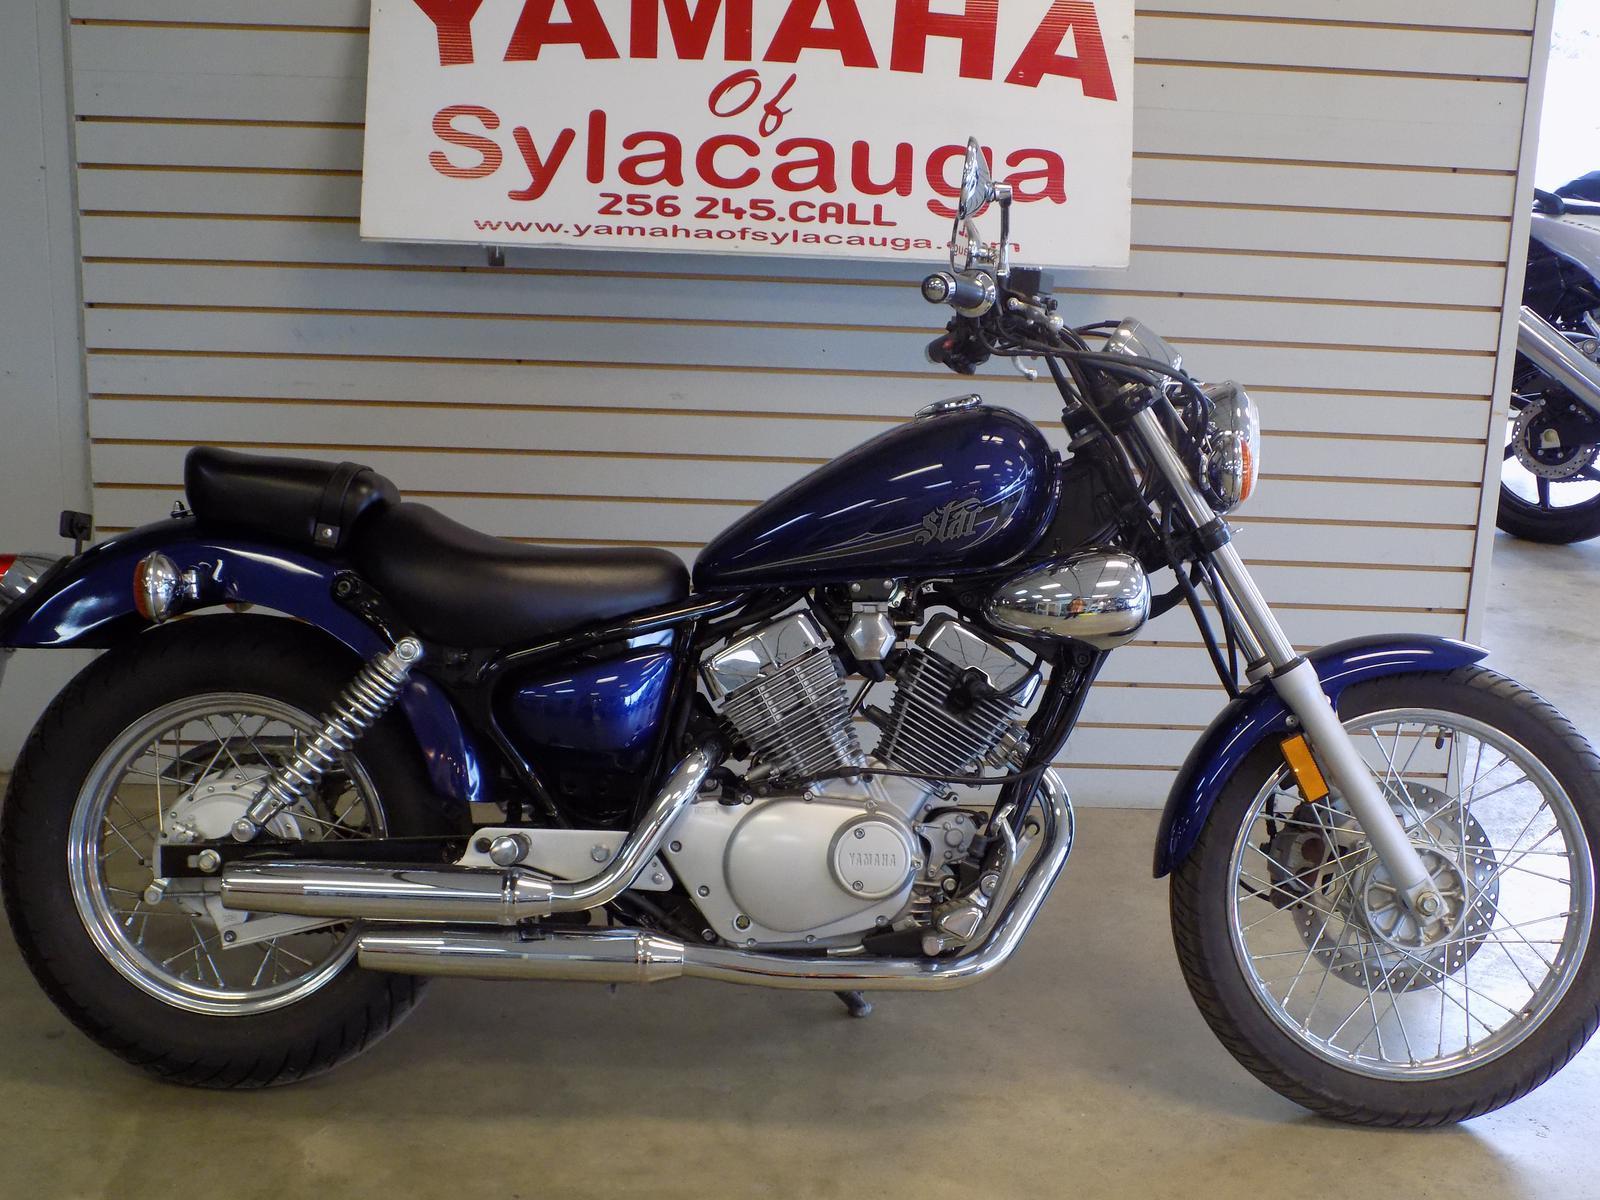 2013 Yamaha Vstar 250 for sale in Sylacauga, AL | Yamaha of ...